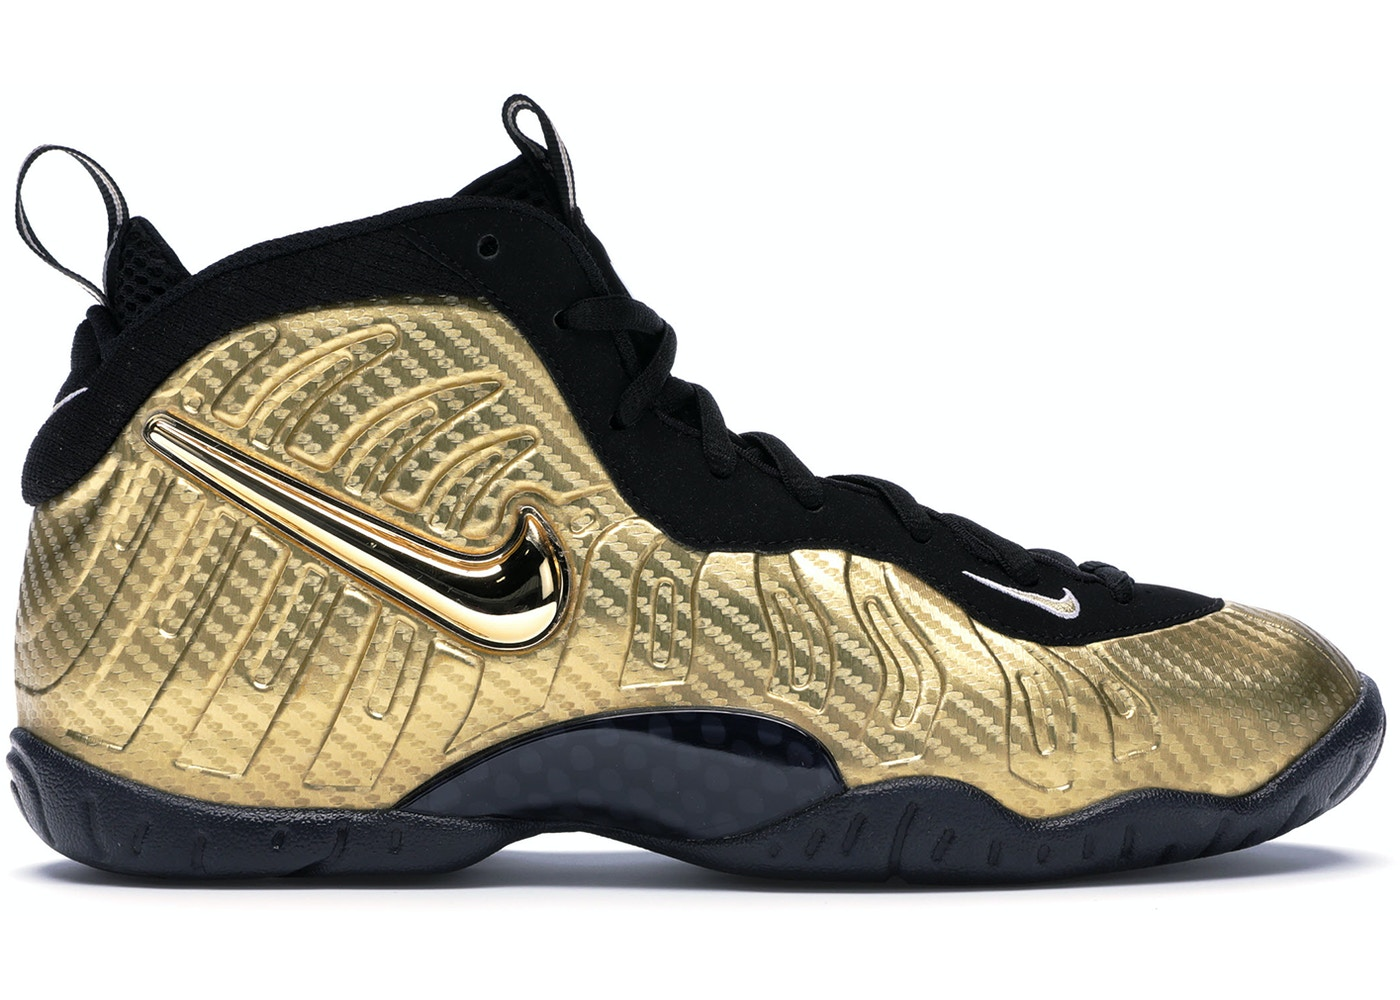 db1e54979ee Air Nike Foamposite Pro Metallic Gold (GS) - 644792-701